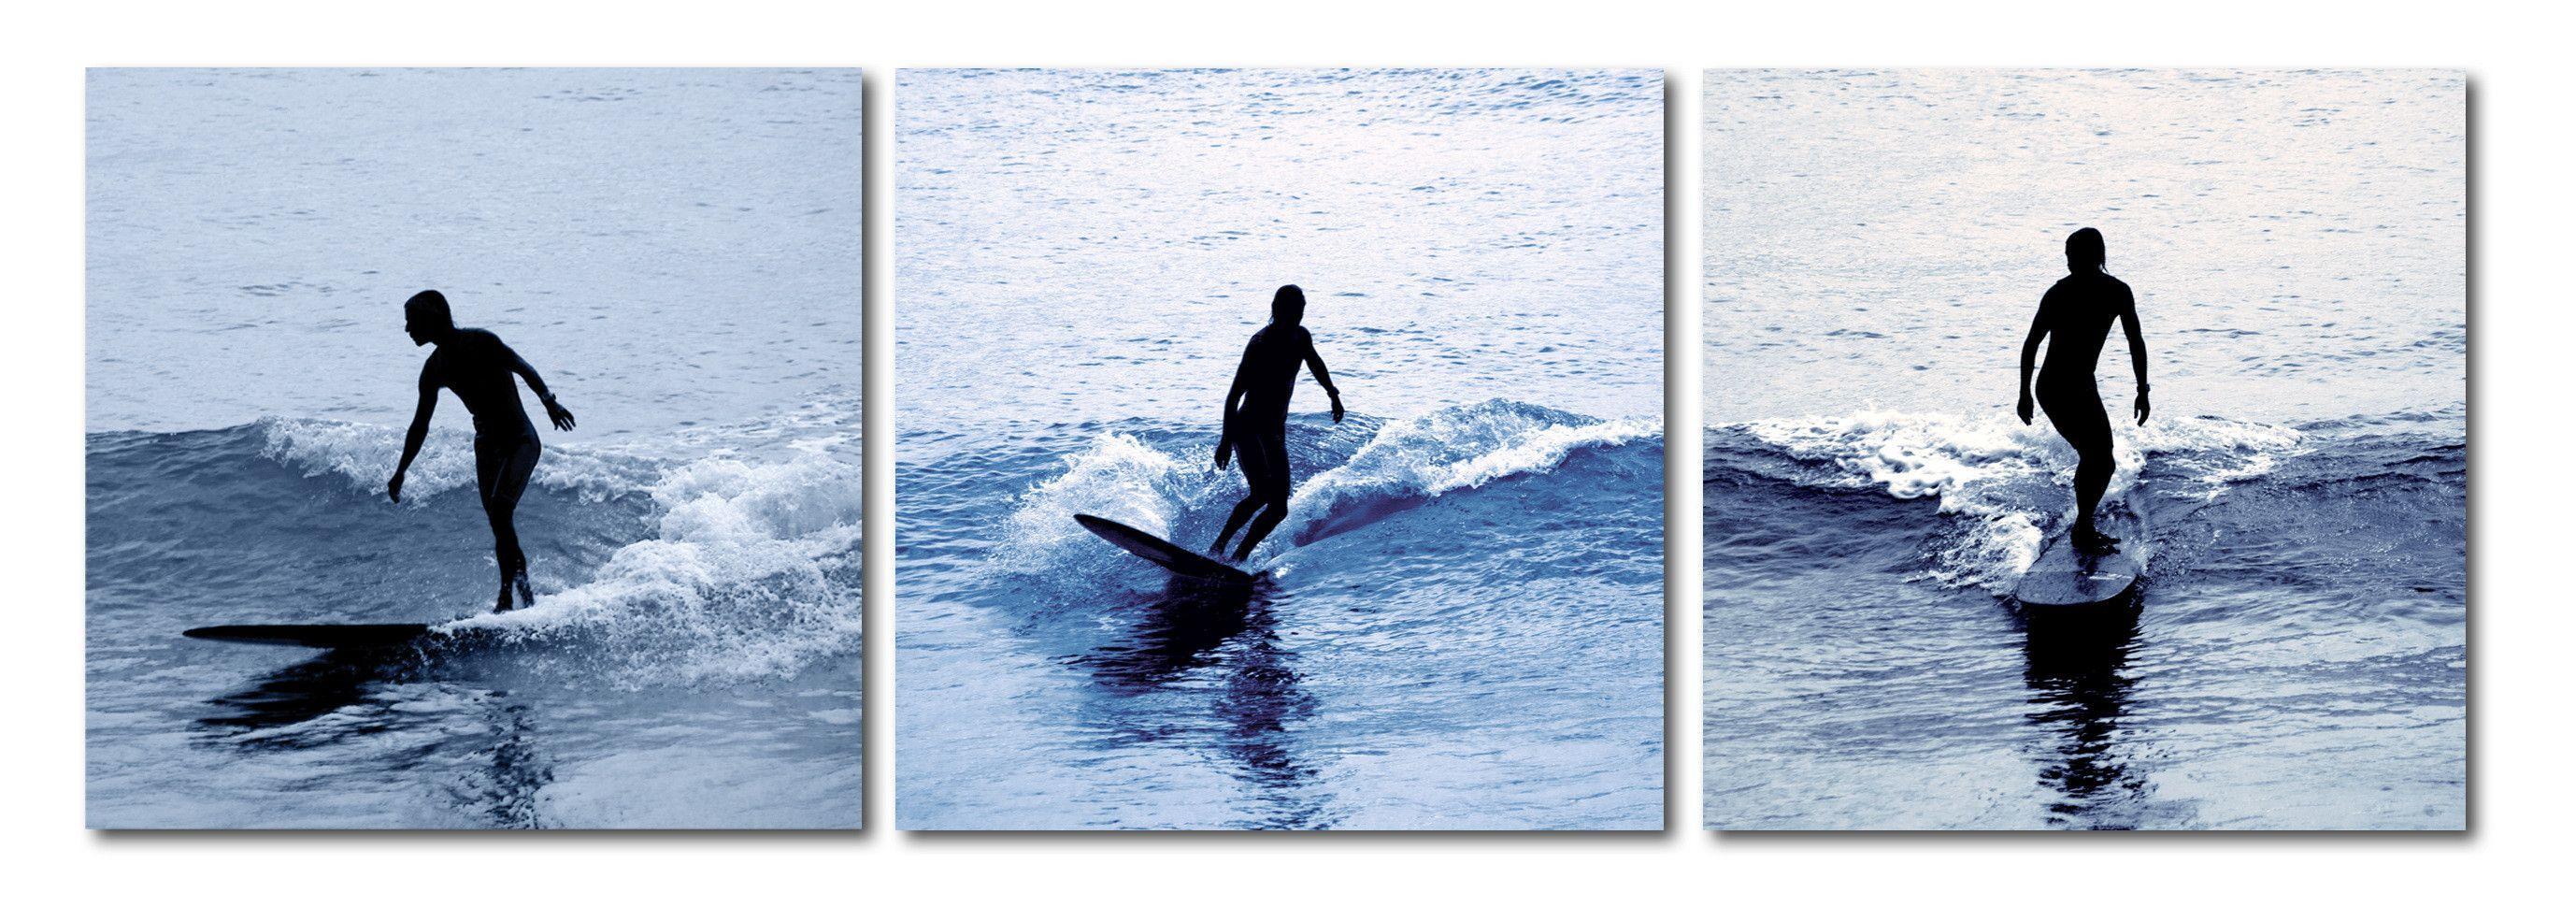 Baxton Studio Surf Silhouettes Mounted Photography Print Triptych Photography Print Triptych Wall Art Wholesale Interiors